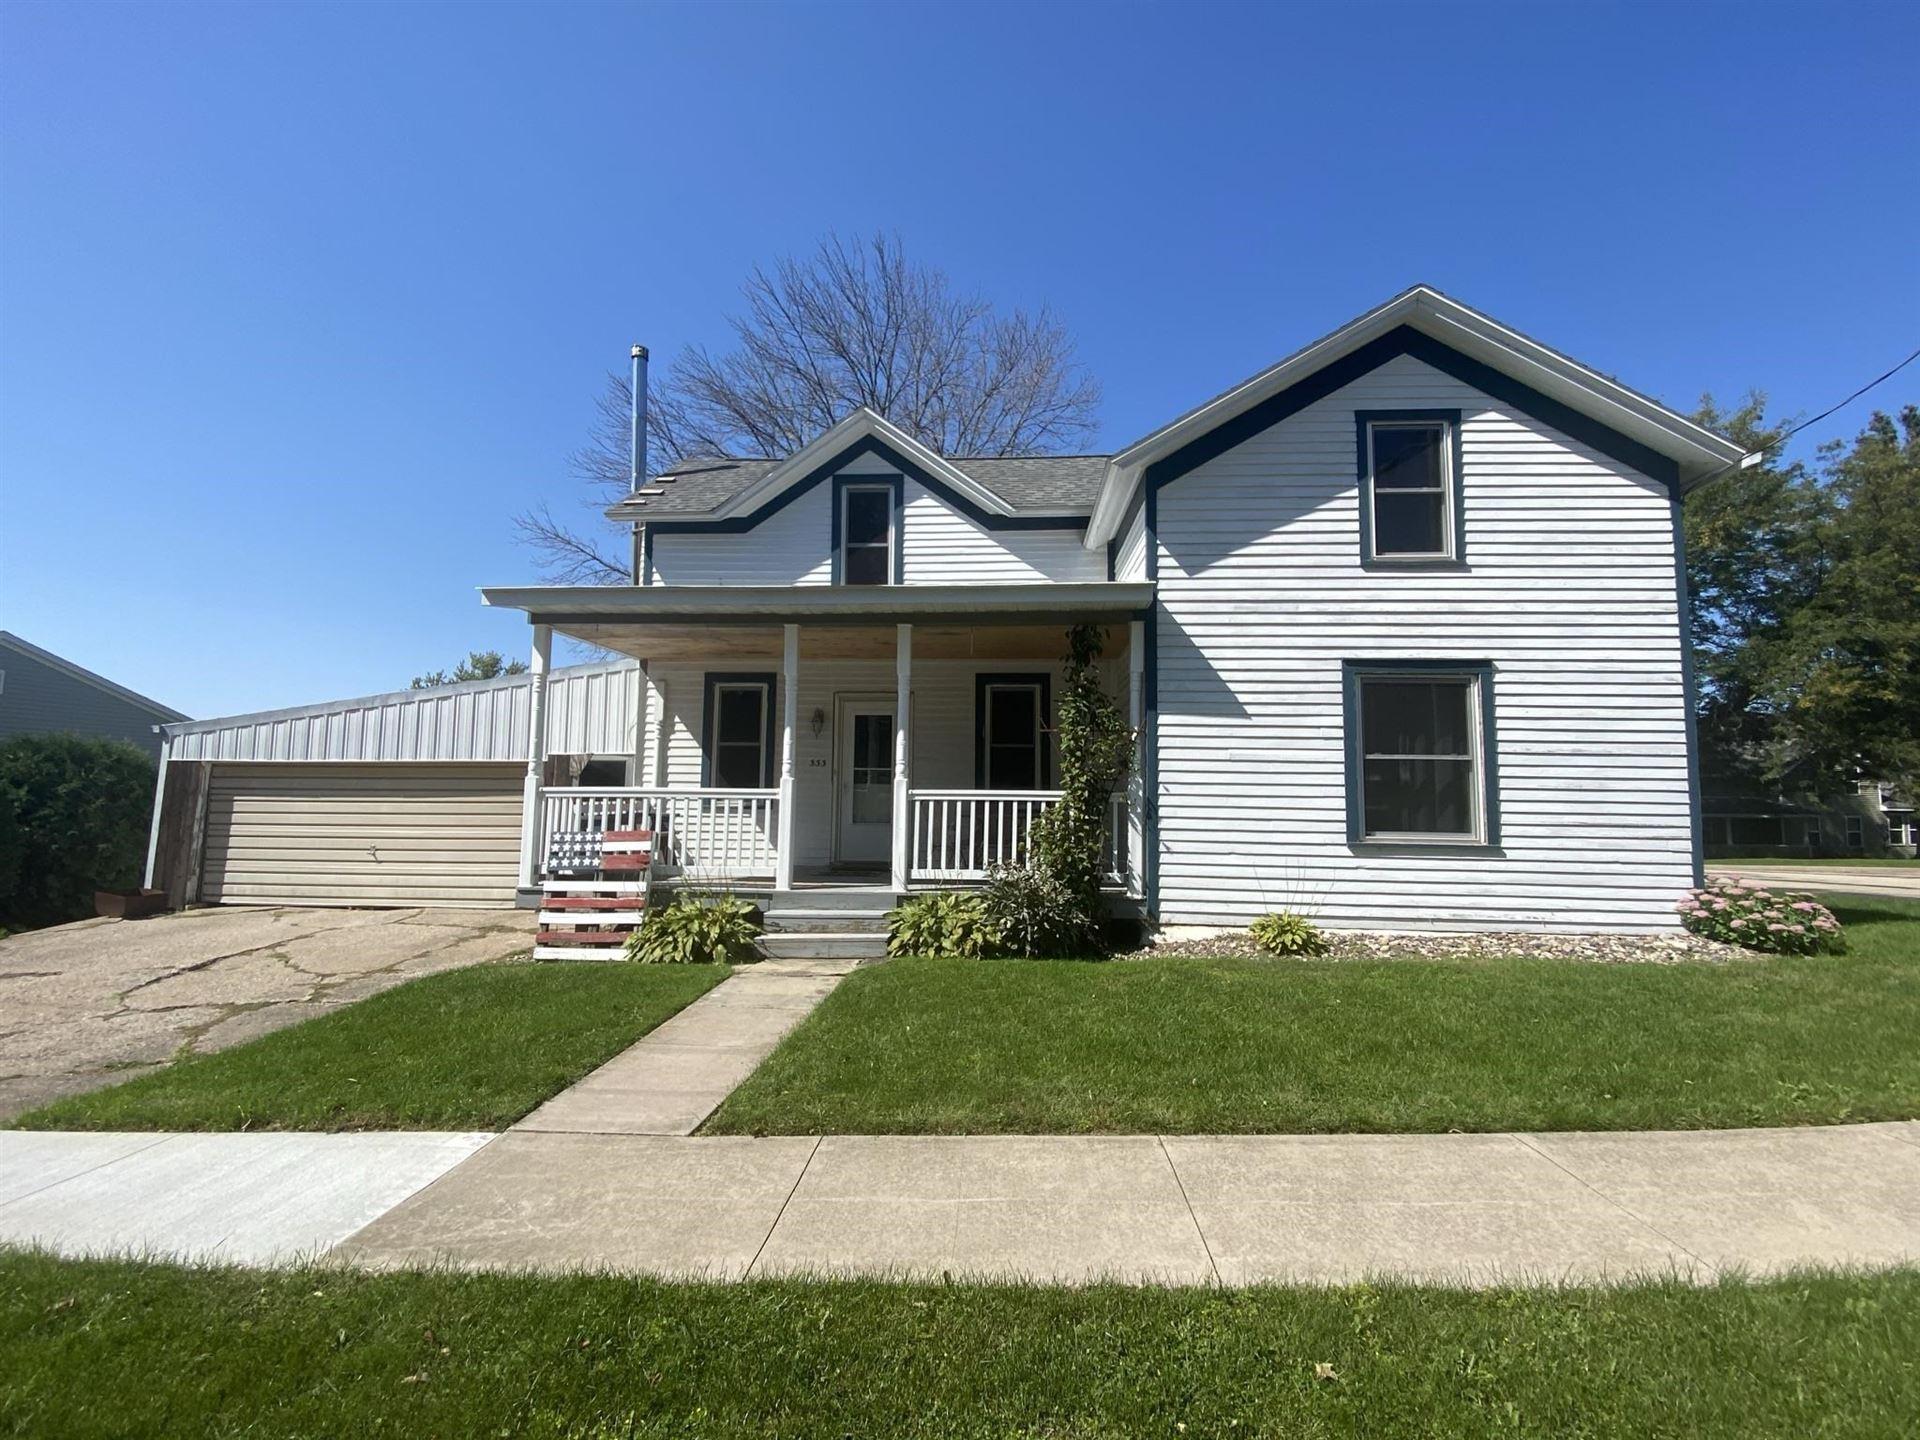 333 Pleasant St, Bloomington, WI 53804-7106 - #: 1920028